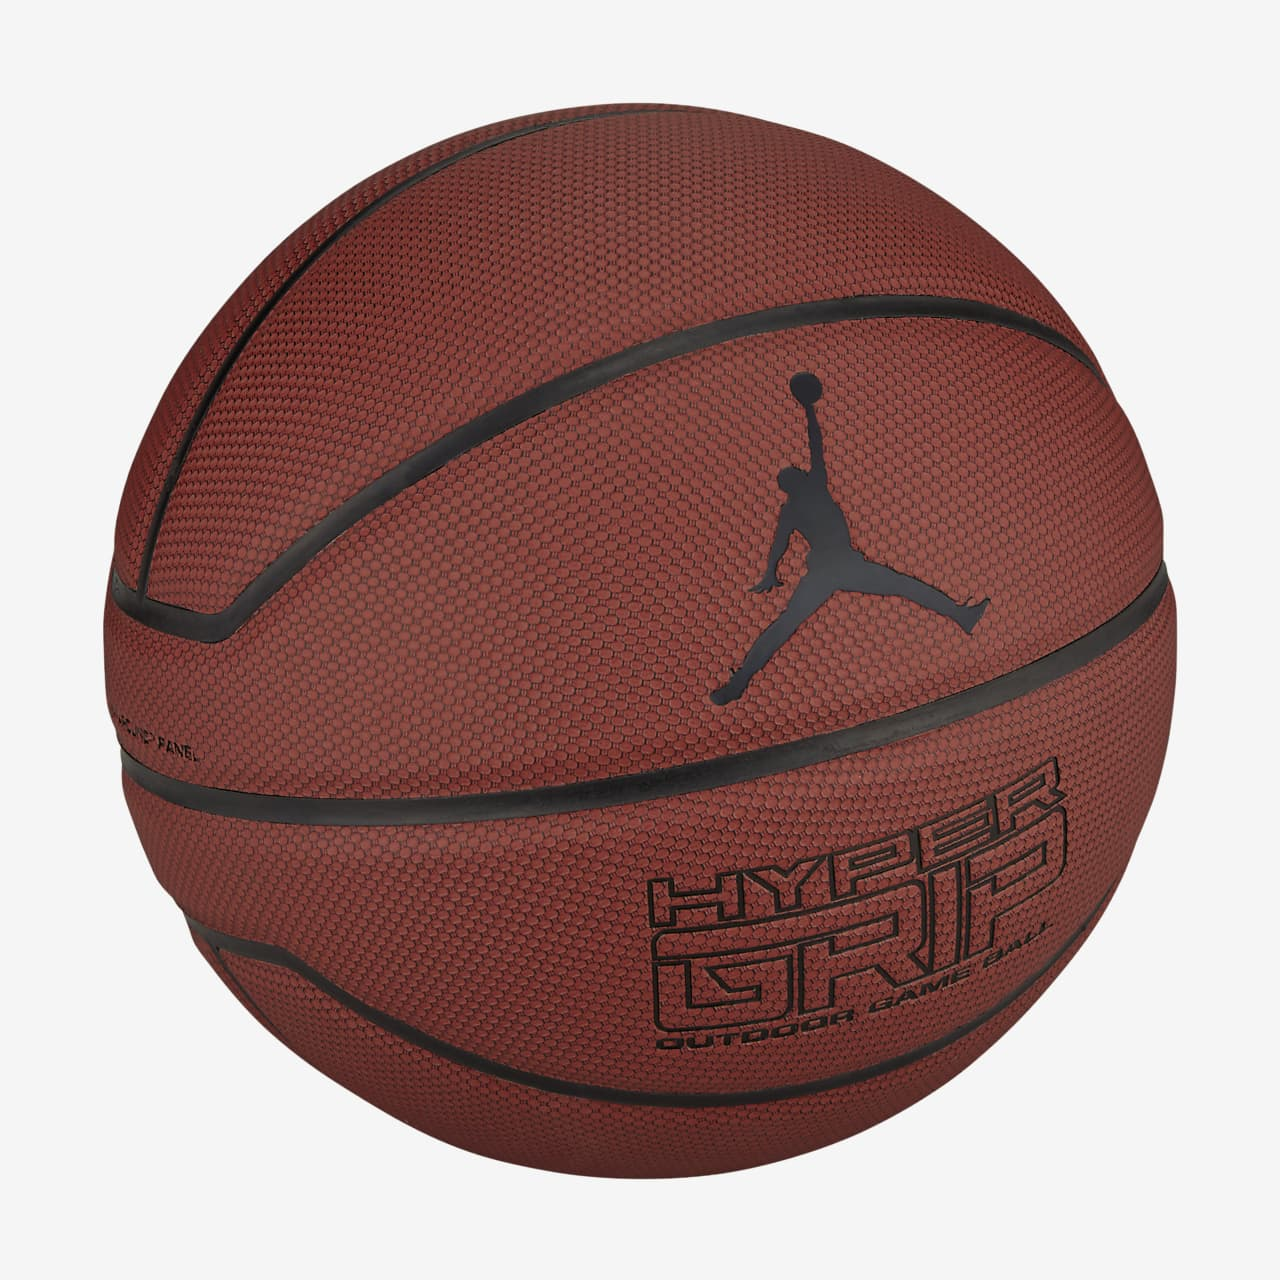 Jordan HyperGrip 4P Basketball (Size 7)